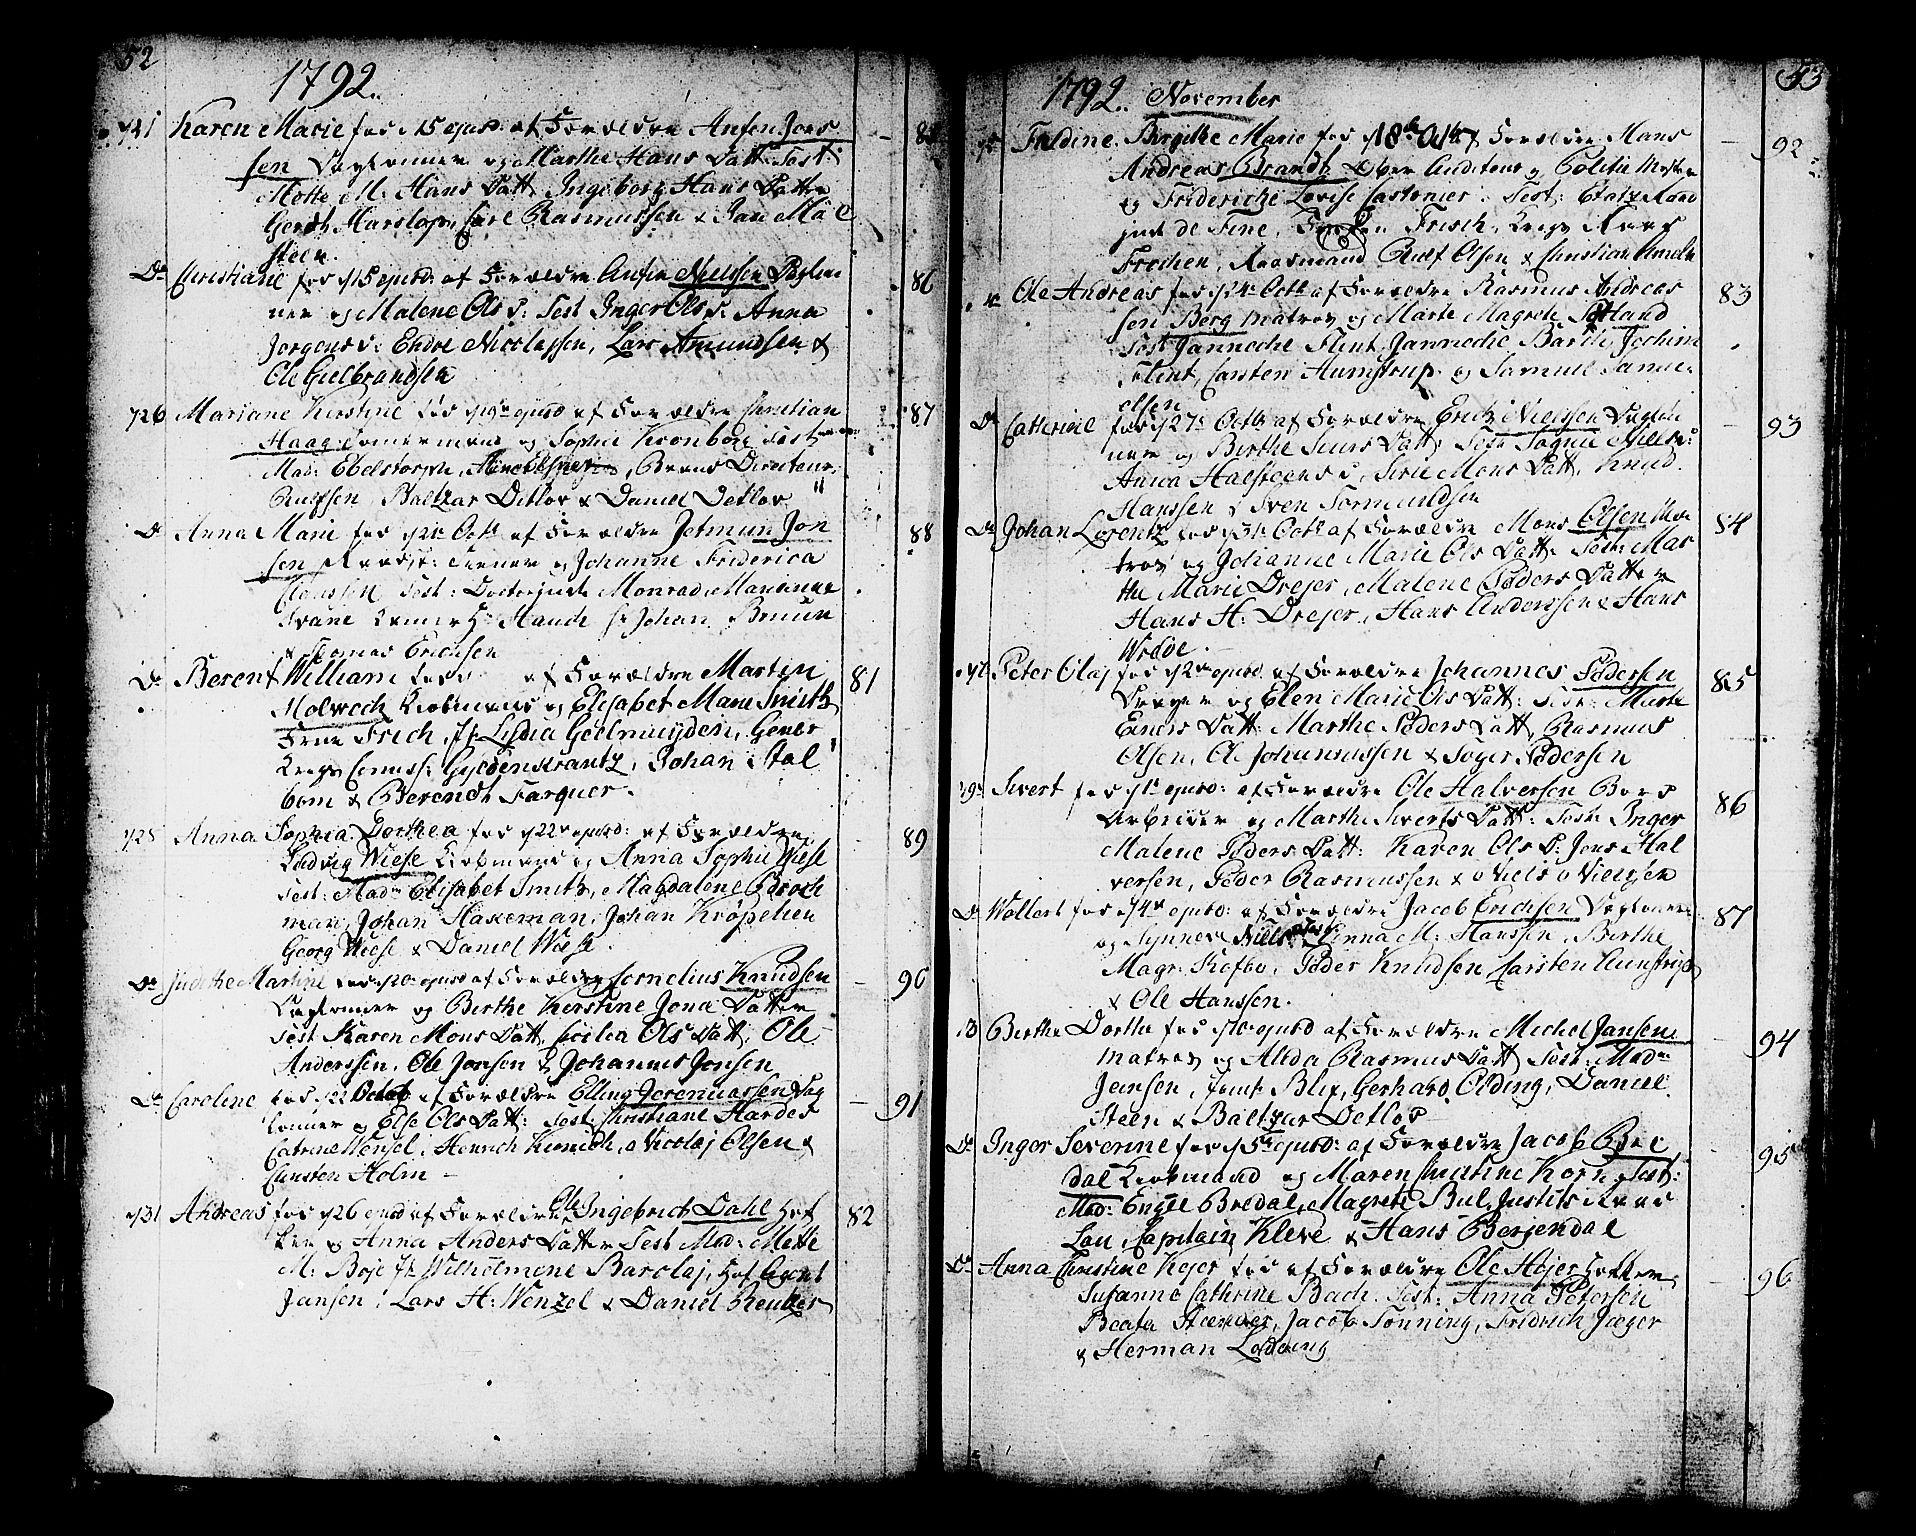 SAB, Domkirken sokneprestembete, H/Haa/L0004: Ministerialbok nr. A 4, 1763-1820, s. 52-53